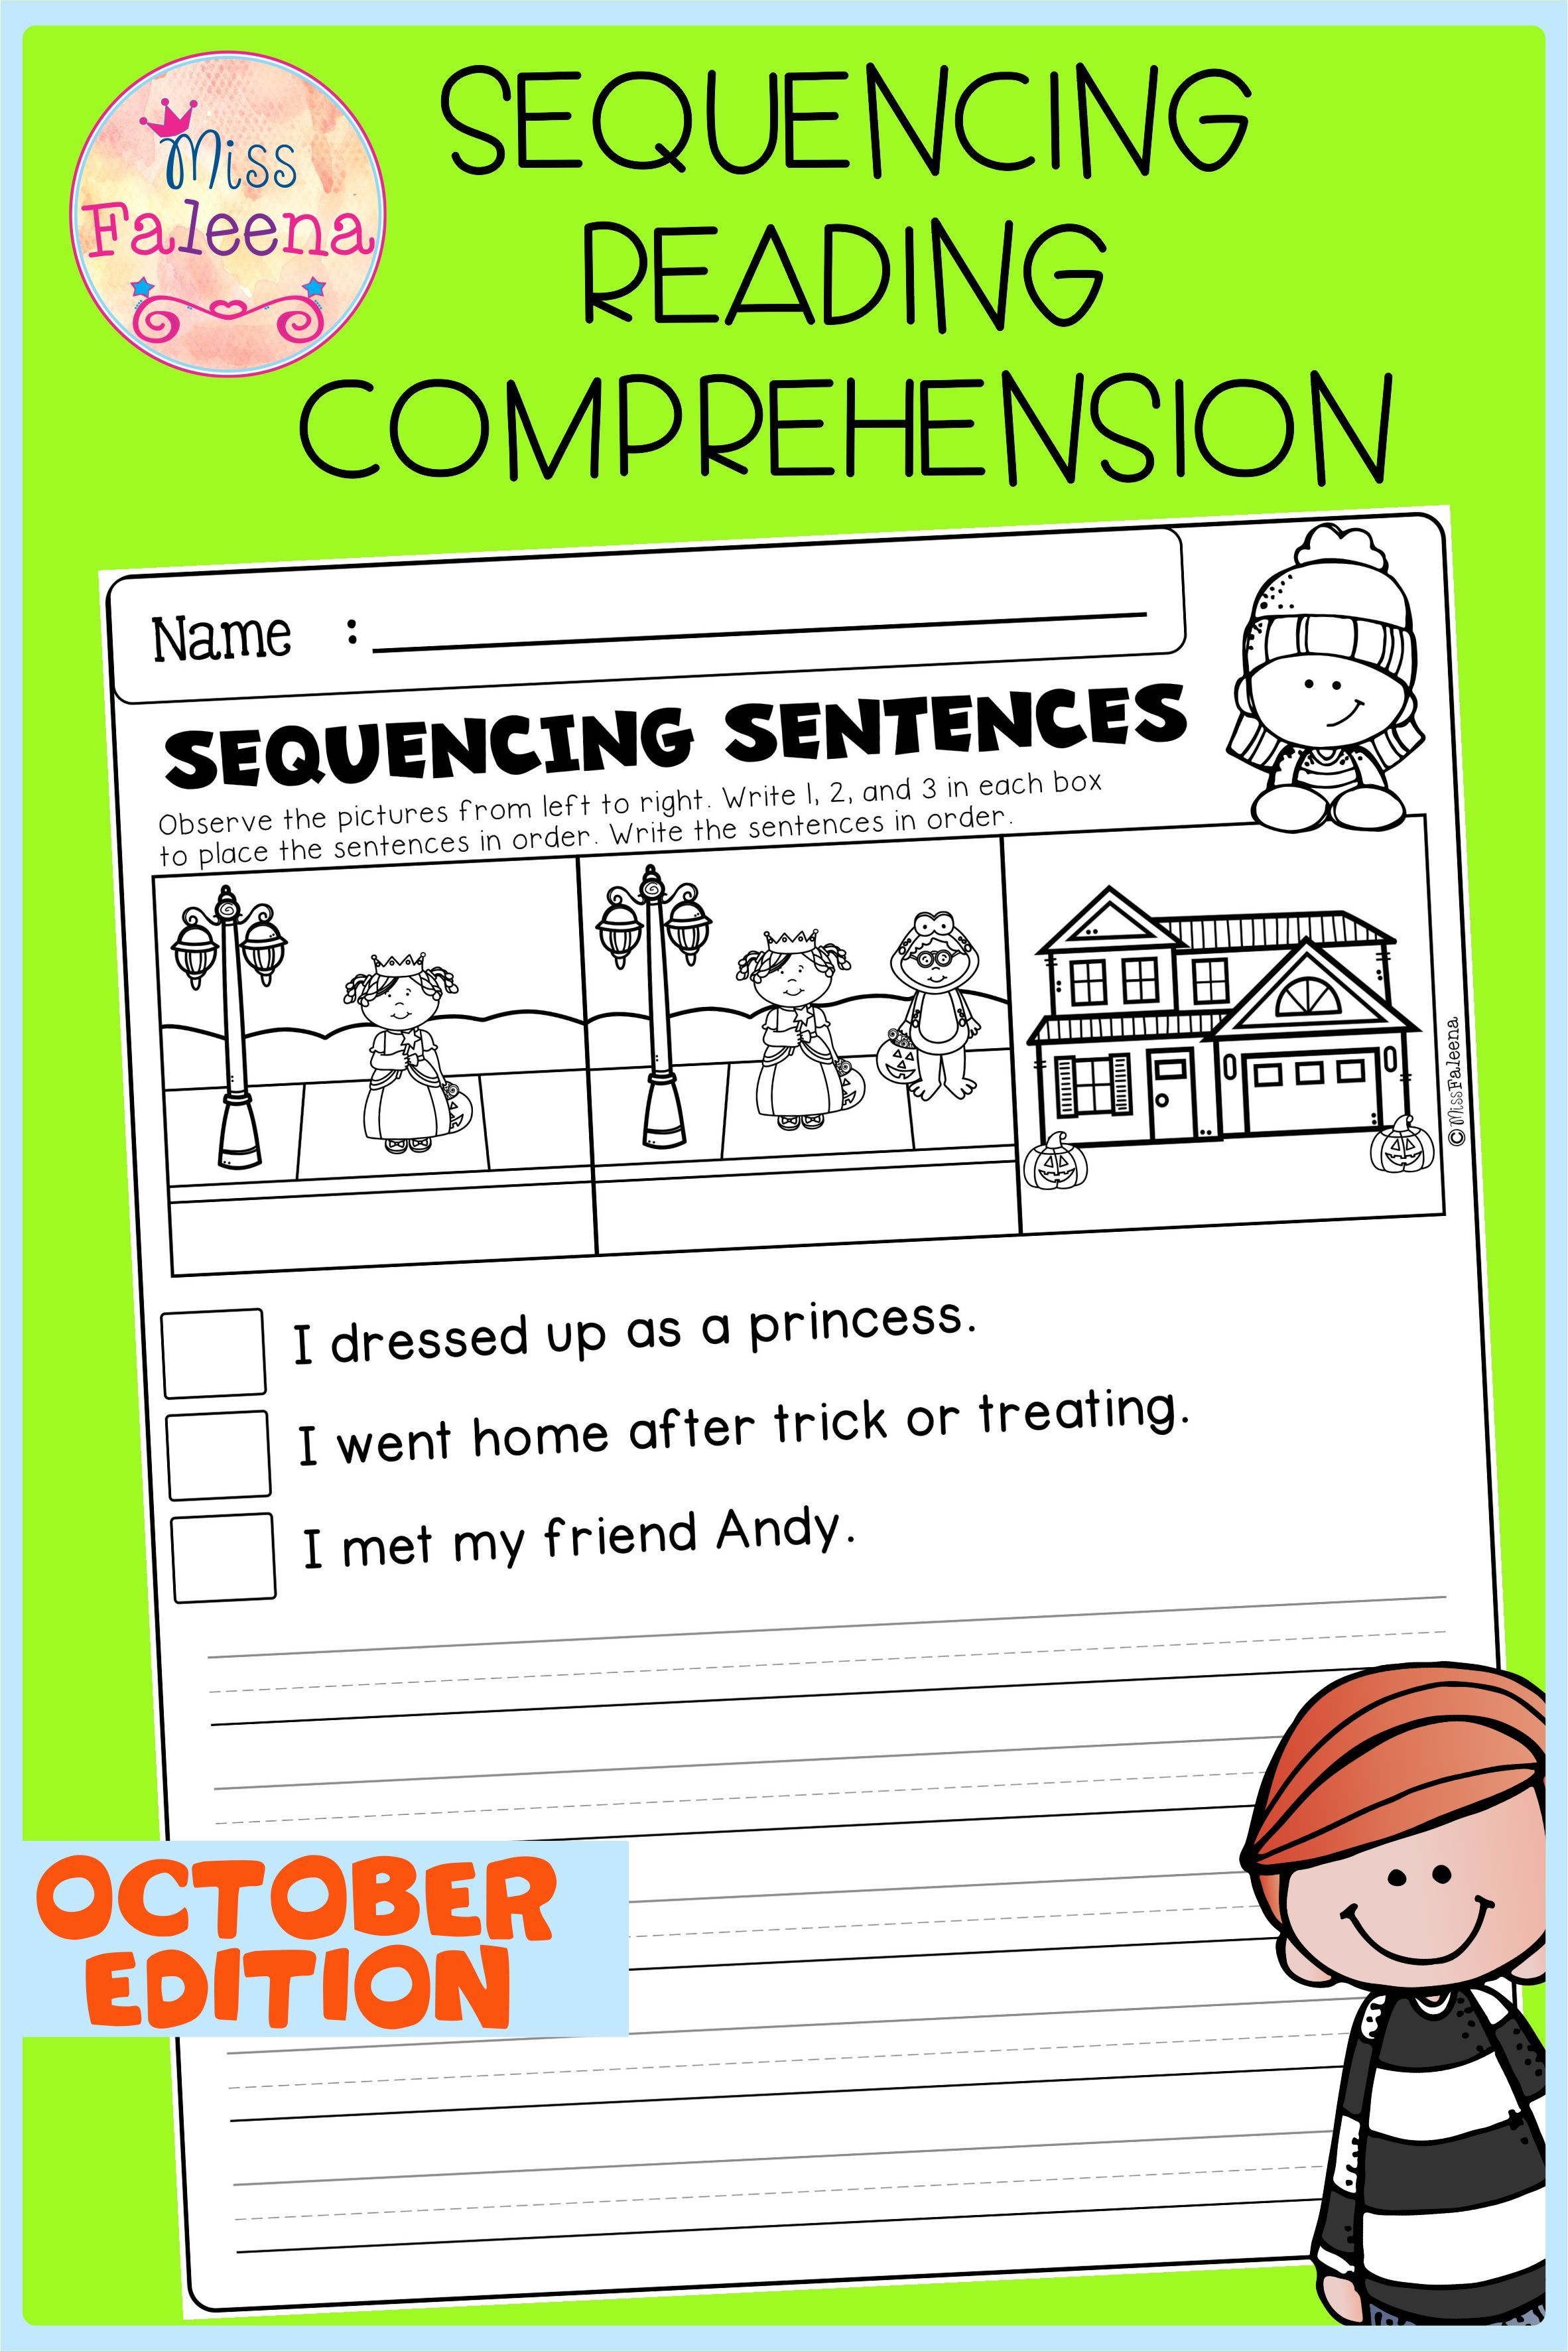 October Sequencing Reading Comprehension Di